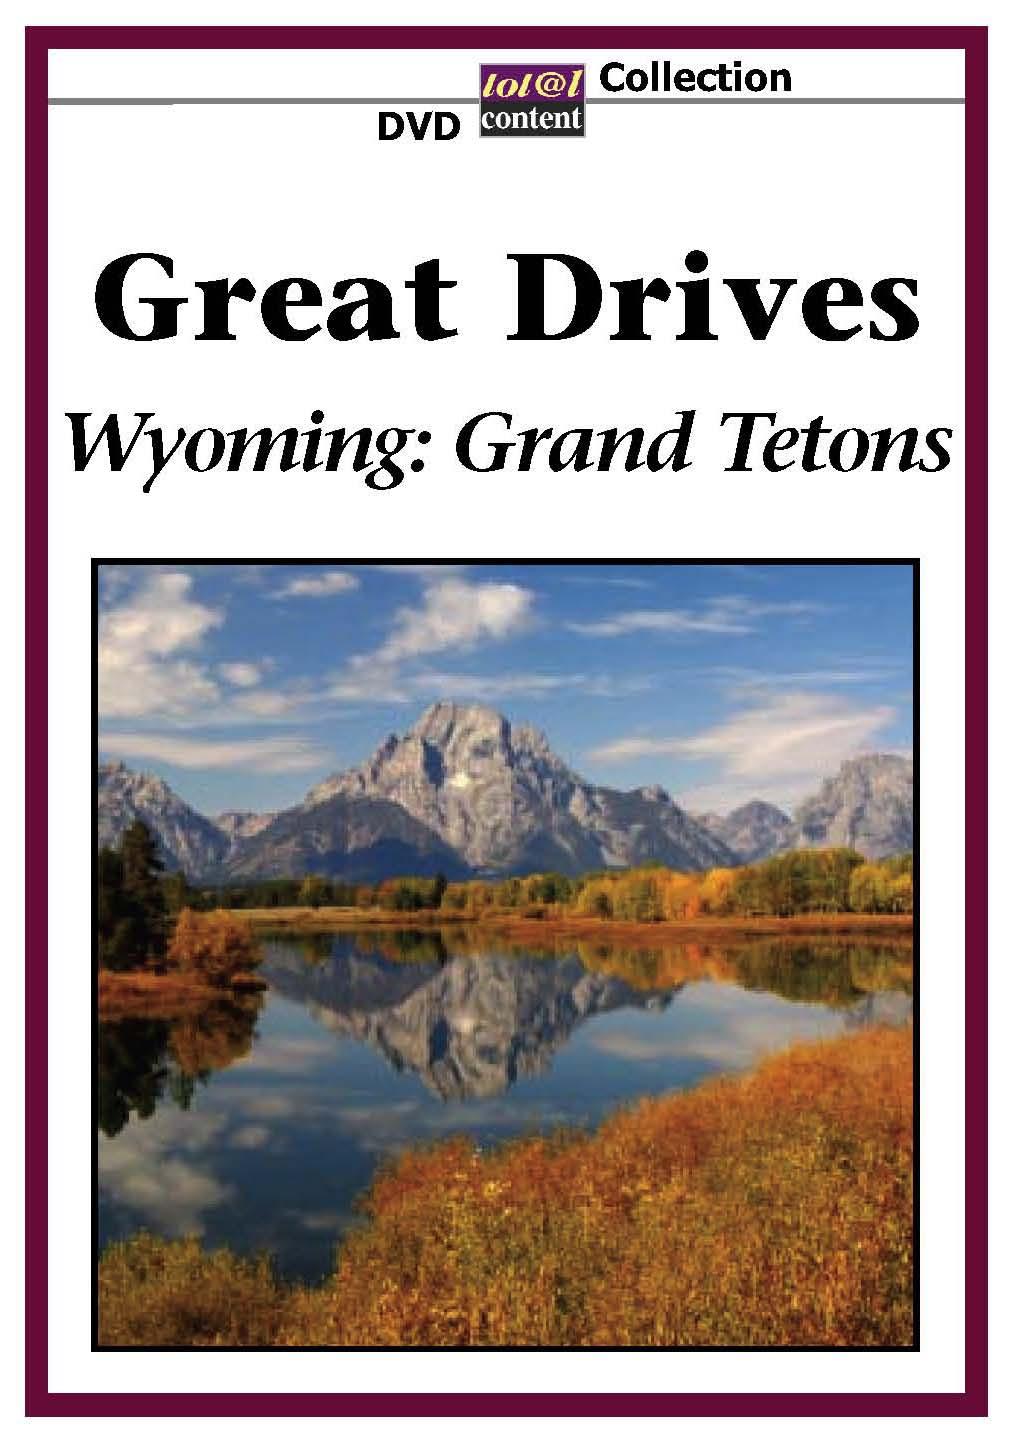 Great Drives: Wyoming - Grand Tetons